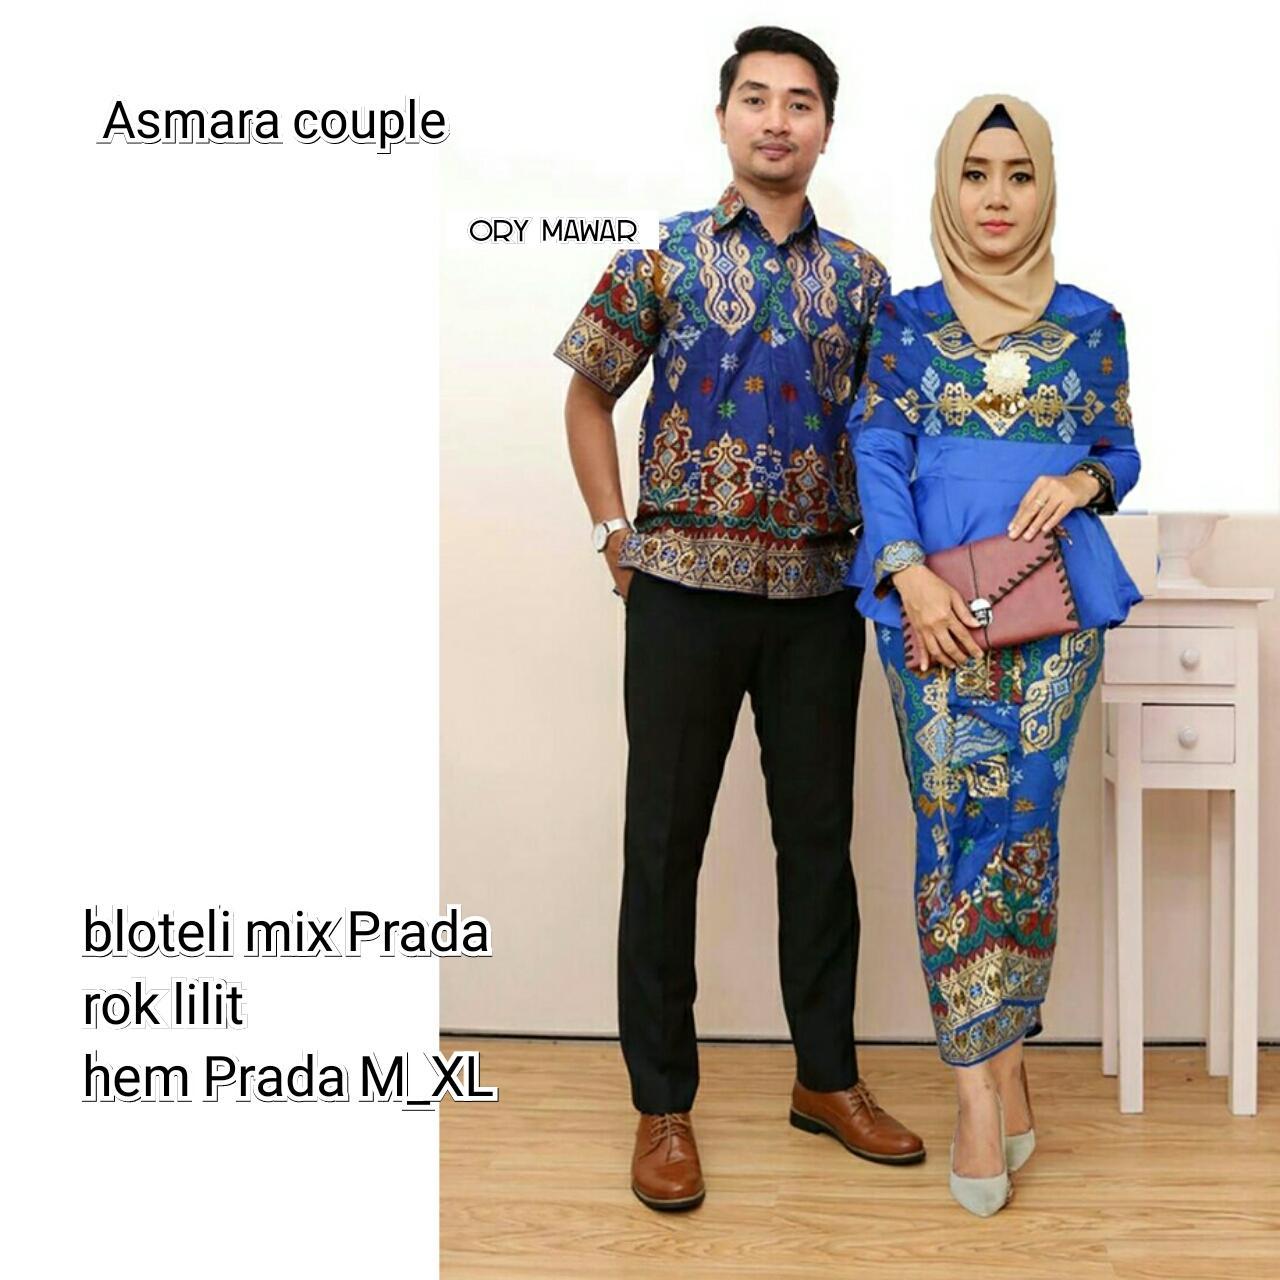 batik couple batik copel batik modern baju setelan baju batik batik wanita batik kondangan pakaian wanita pakaian muslim wanita batik kebaya batik sarimbit ...